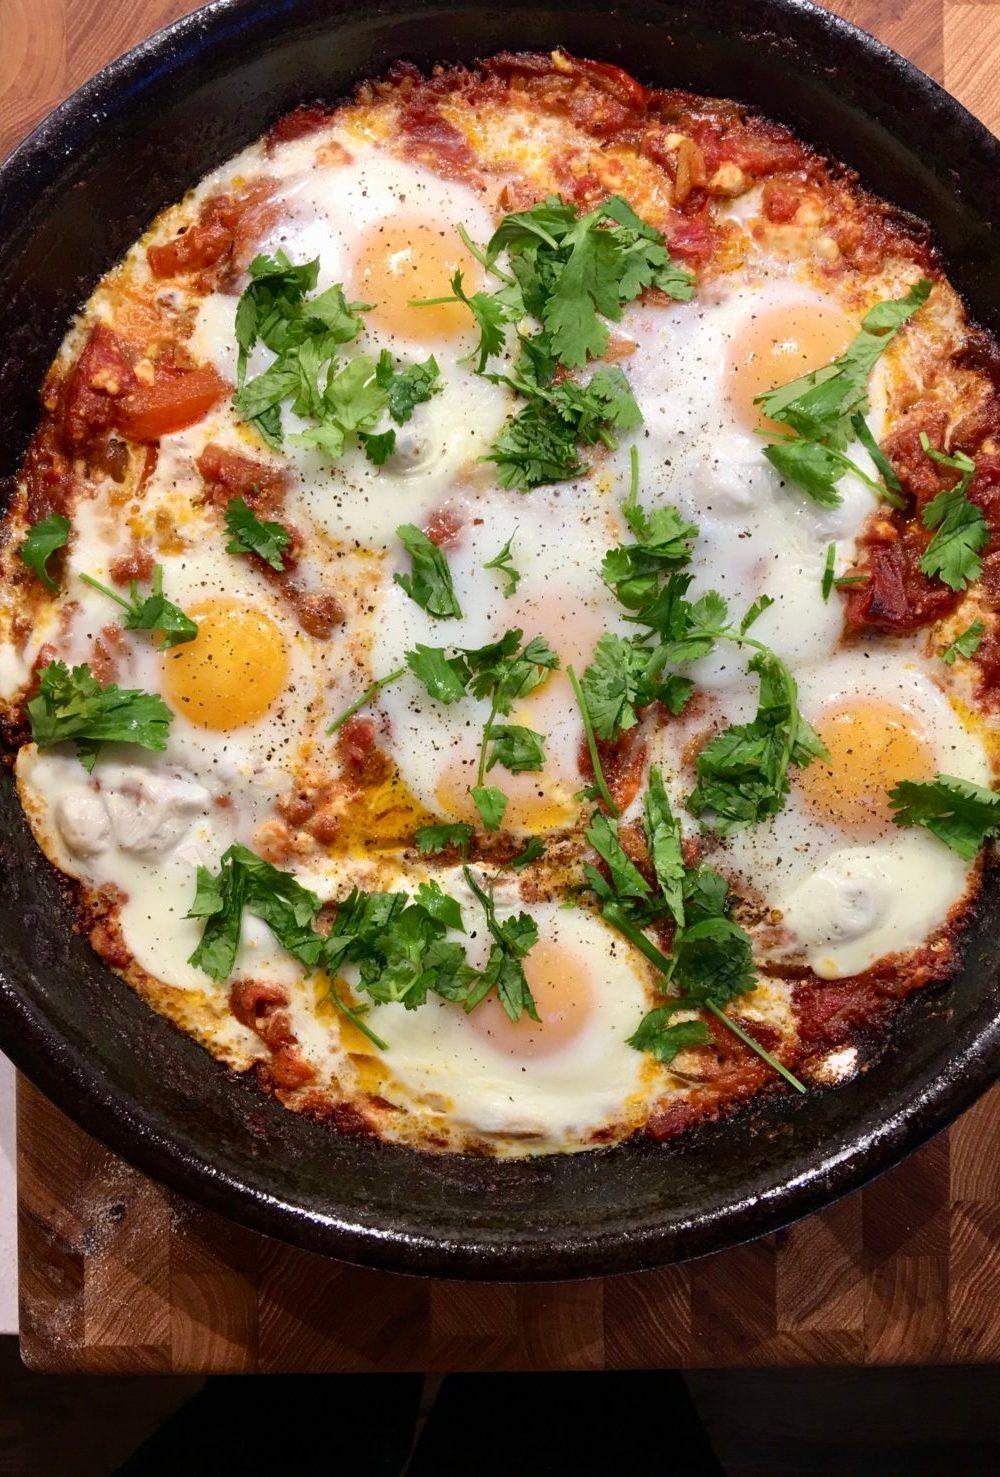 Tomato, Egg, and Feta Shakshuka